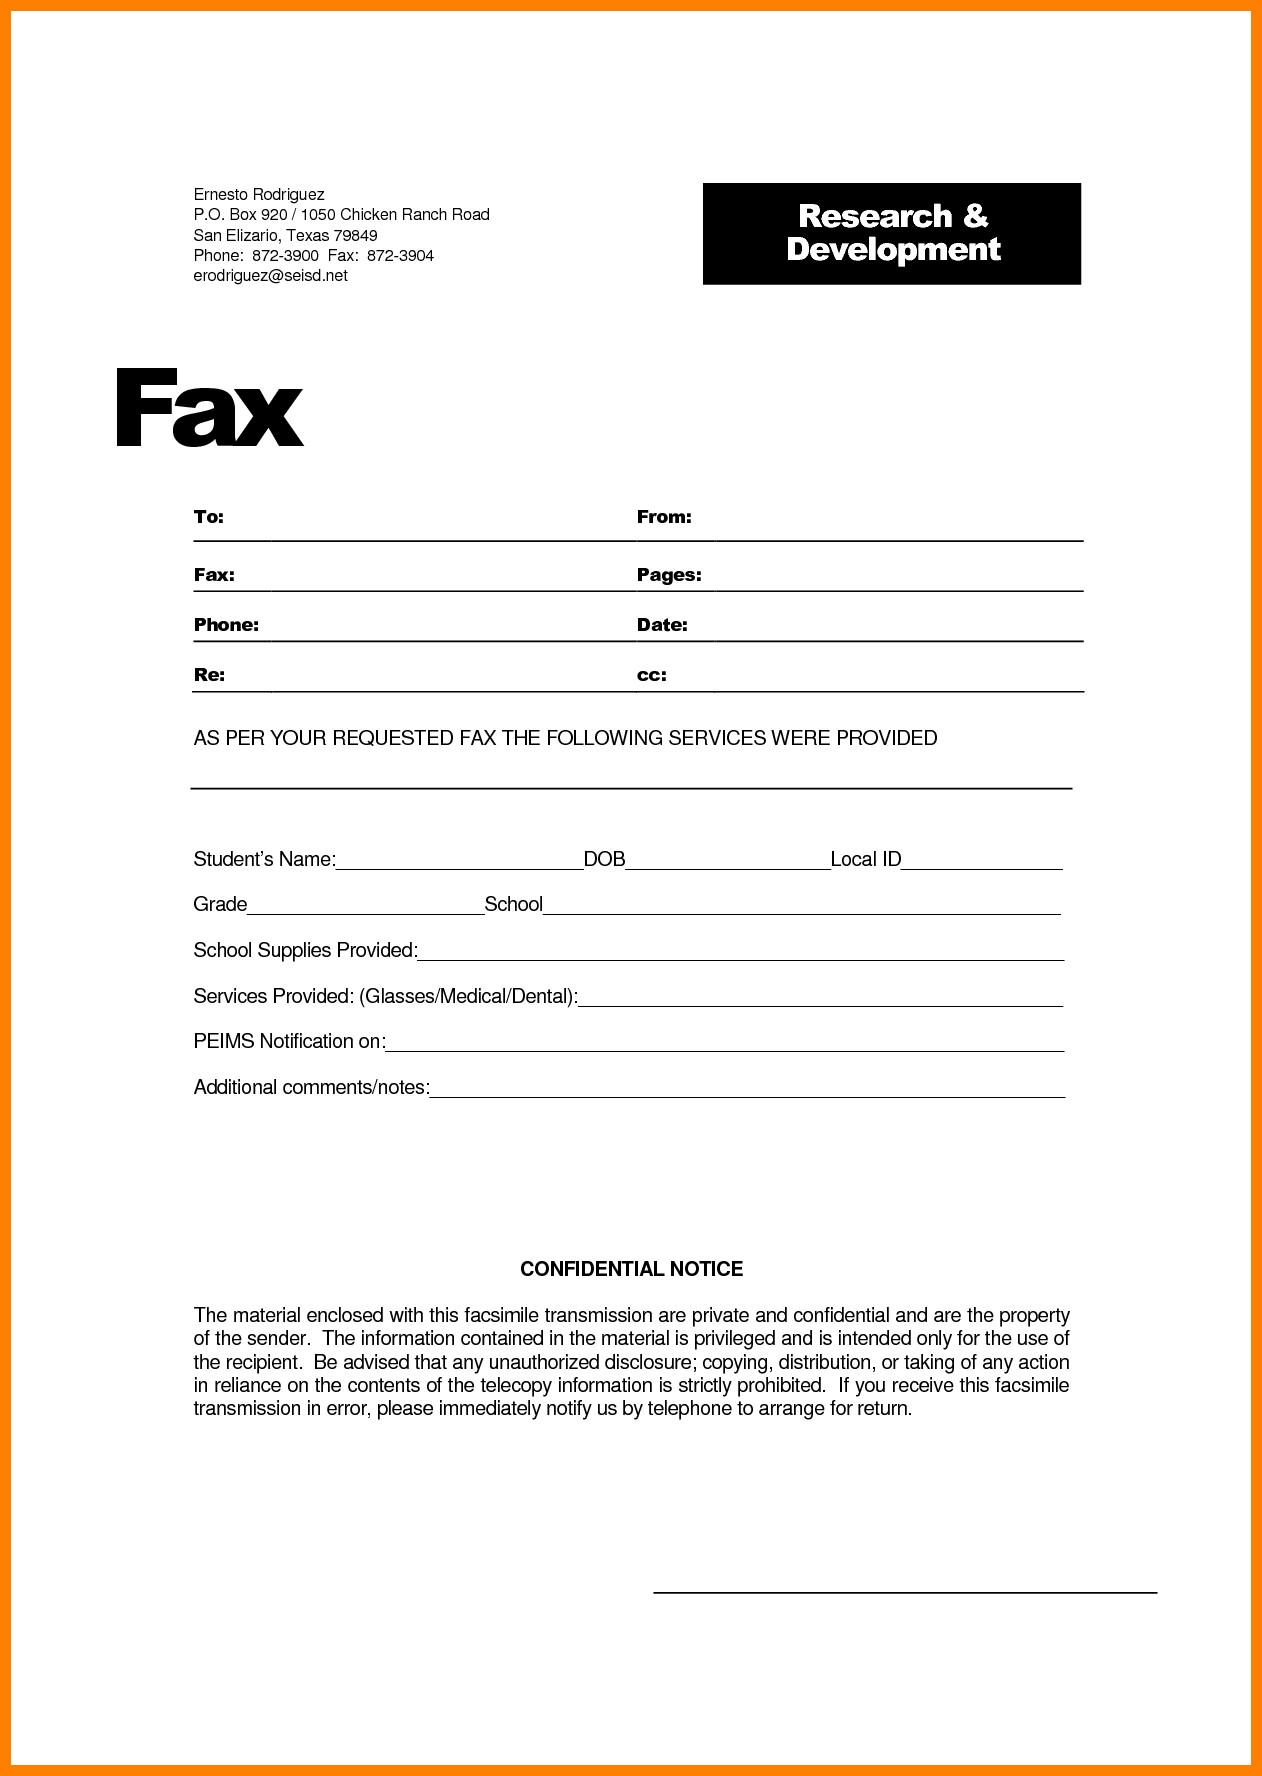 Hipaa Fax Cover Sheet 9 Hipaa Fax Confidentiality Statement